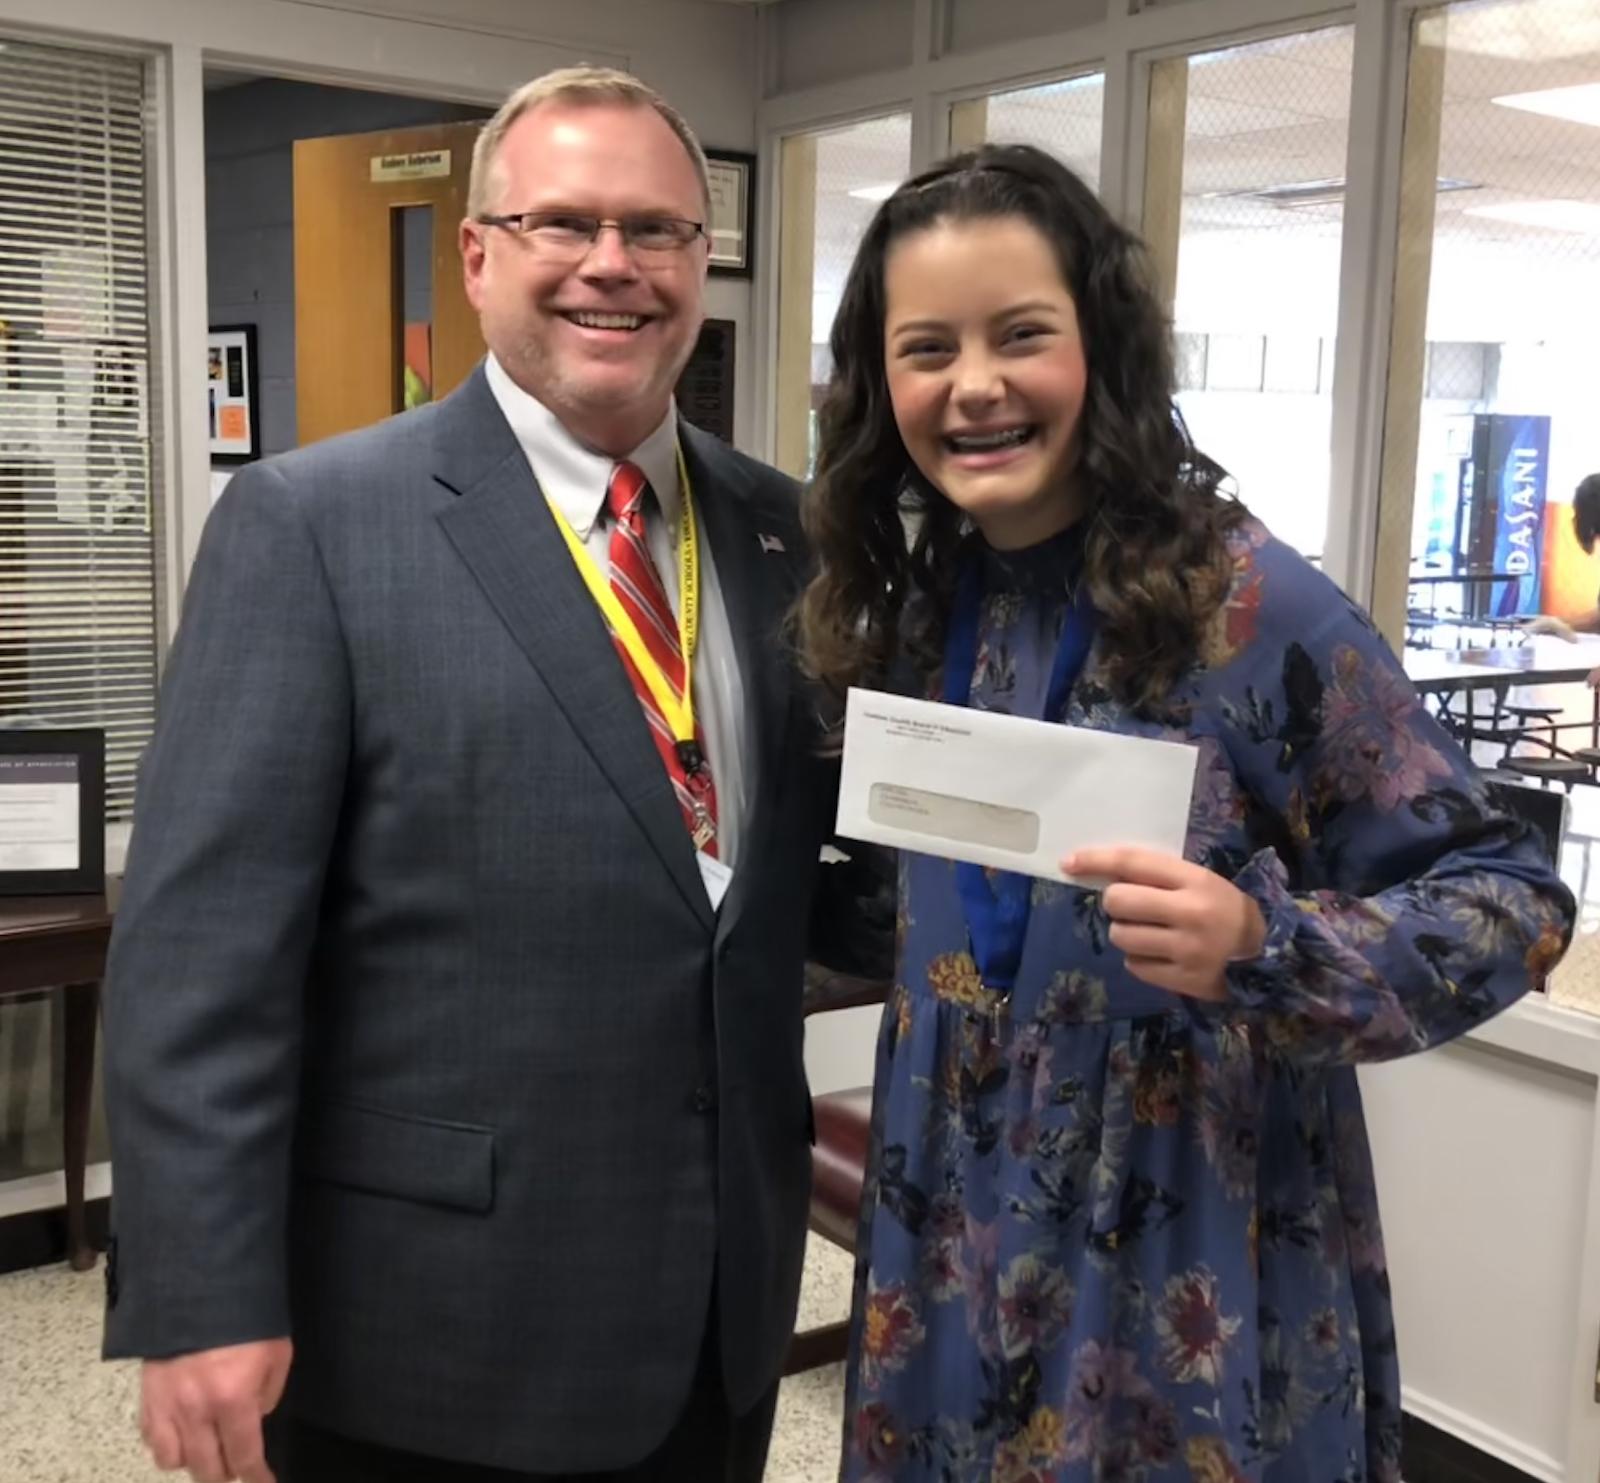 Attendance Awareness Month essay contest winner Eliza Smith